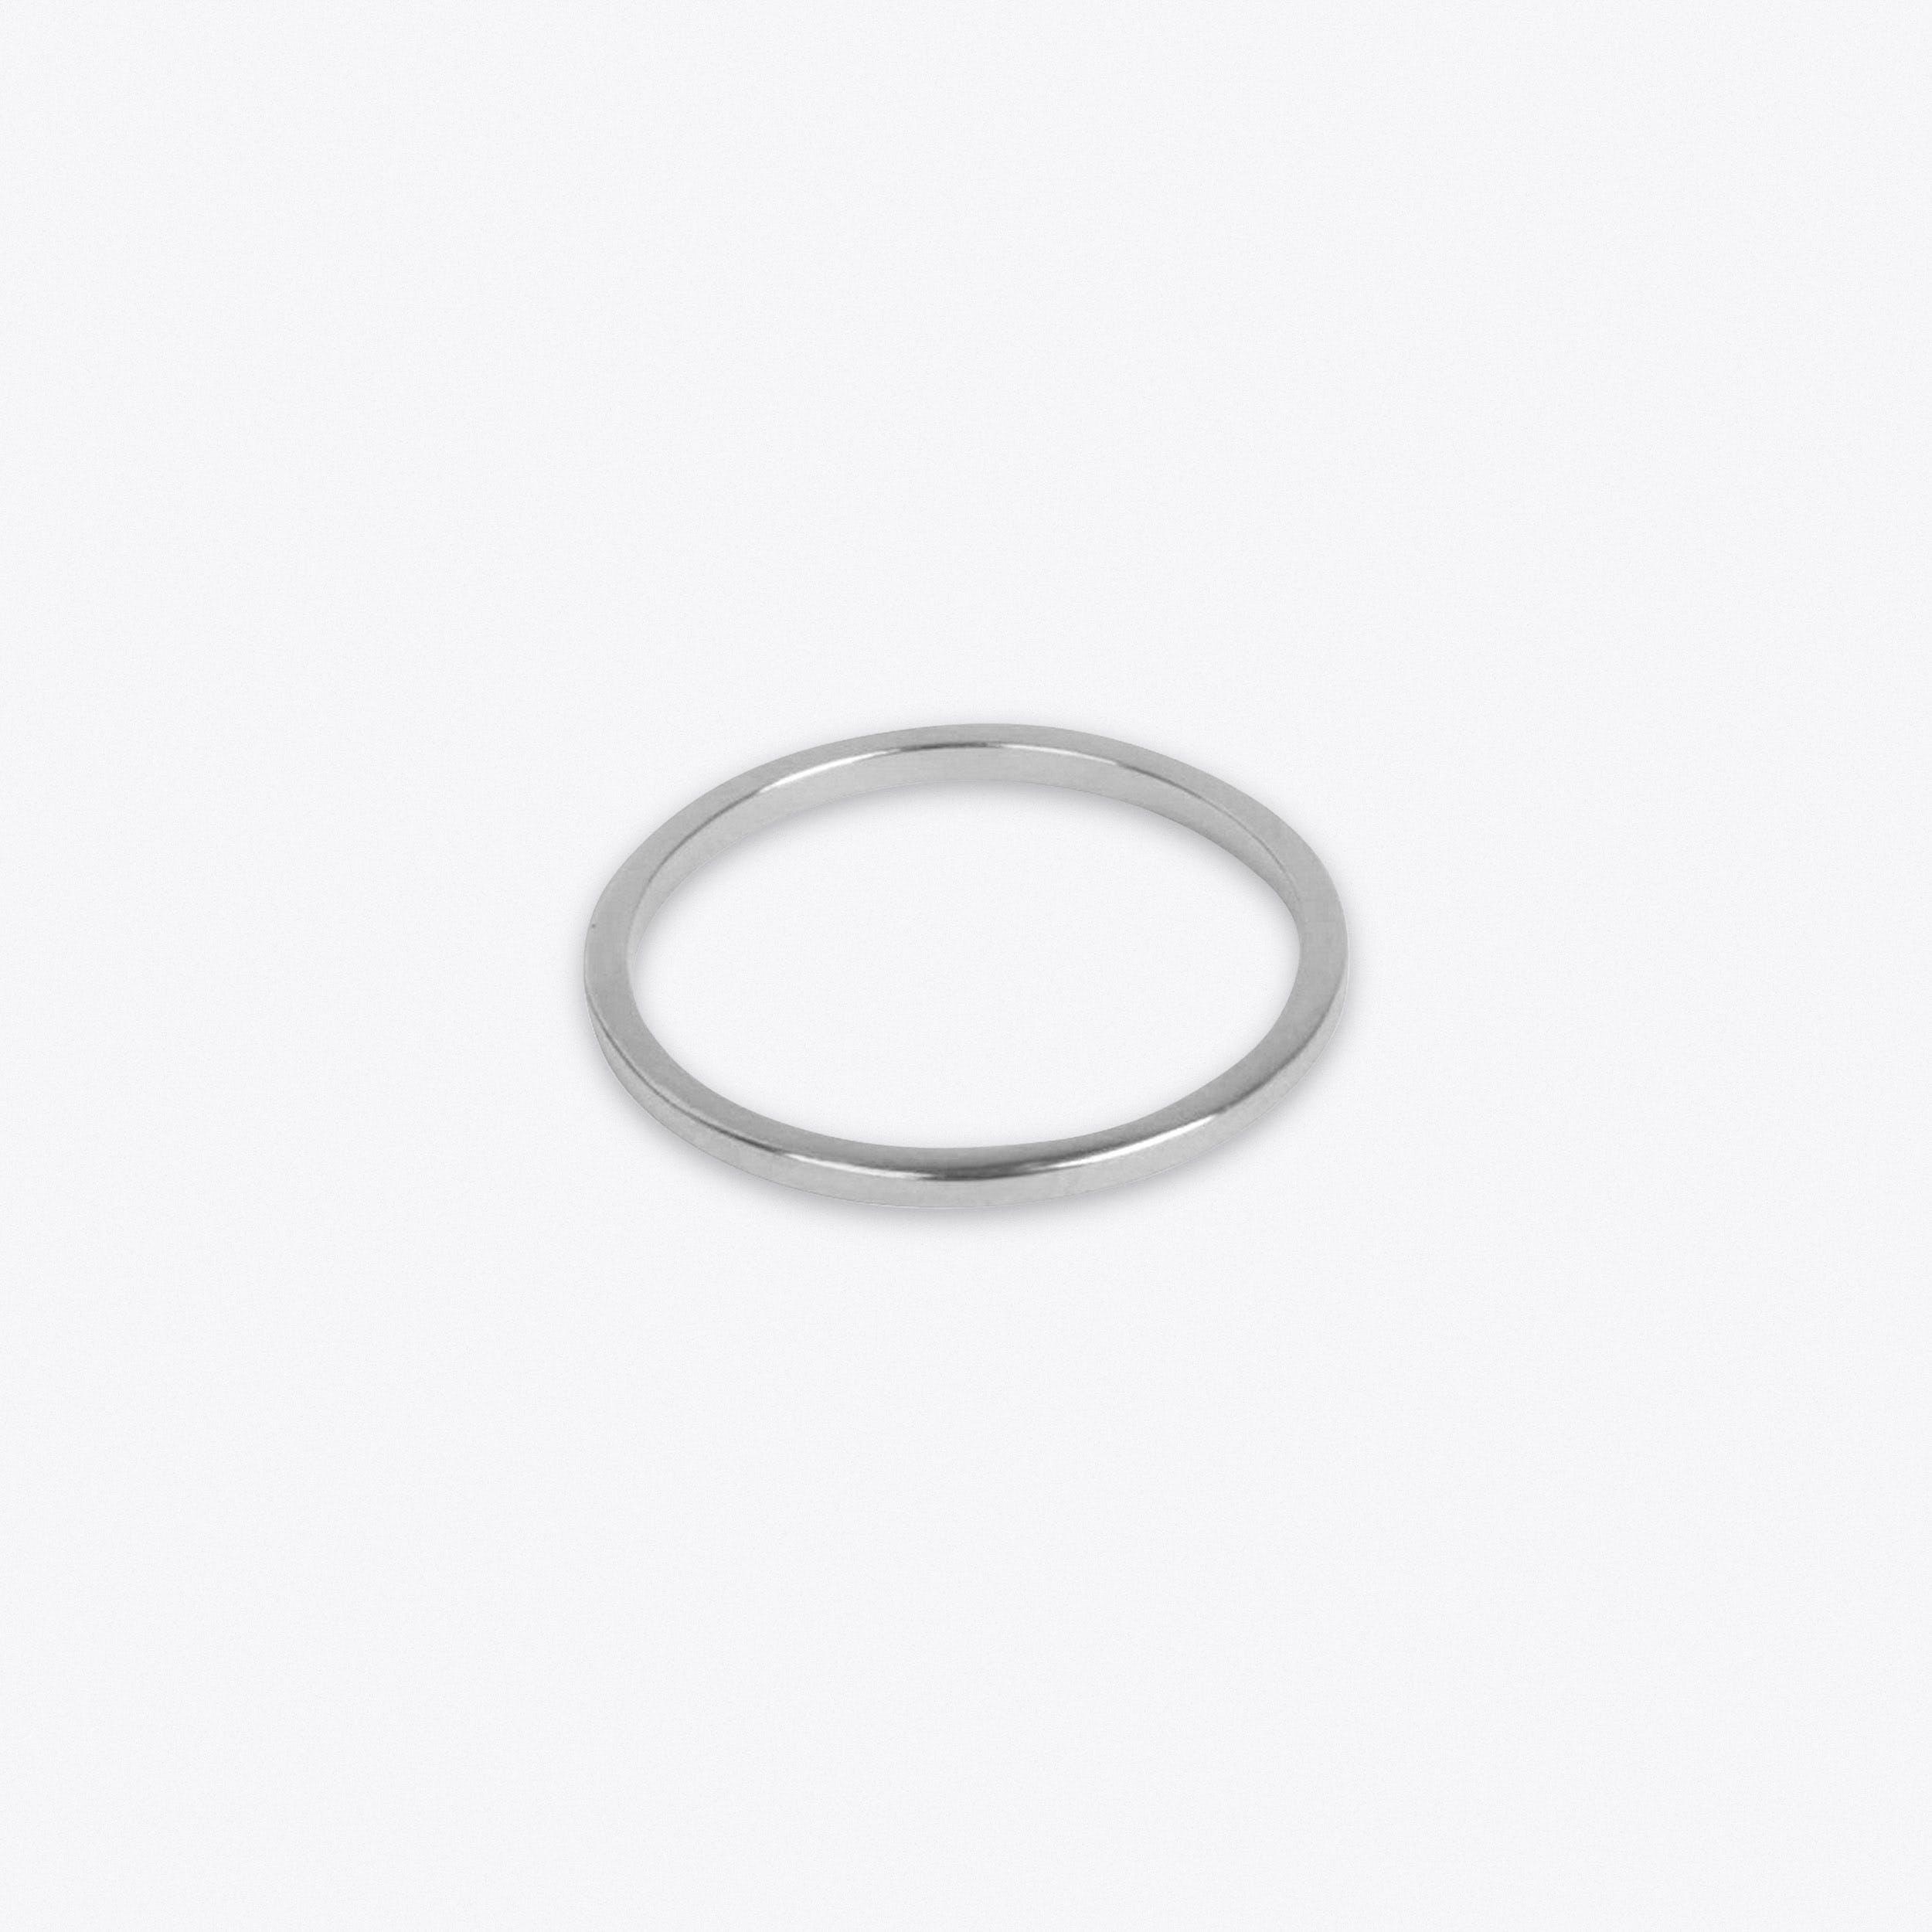 Lightweight Ring in Silver